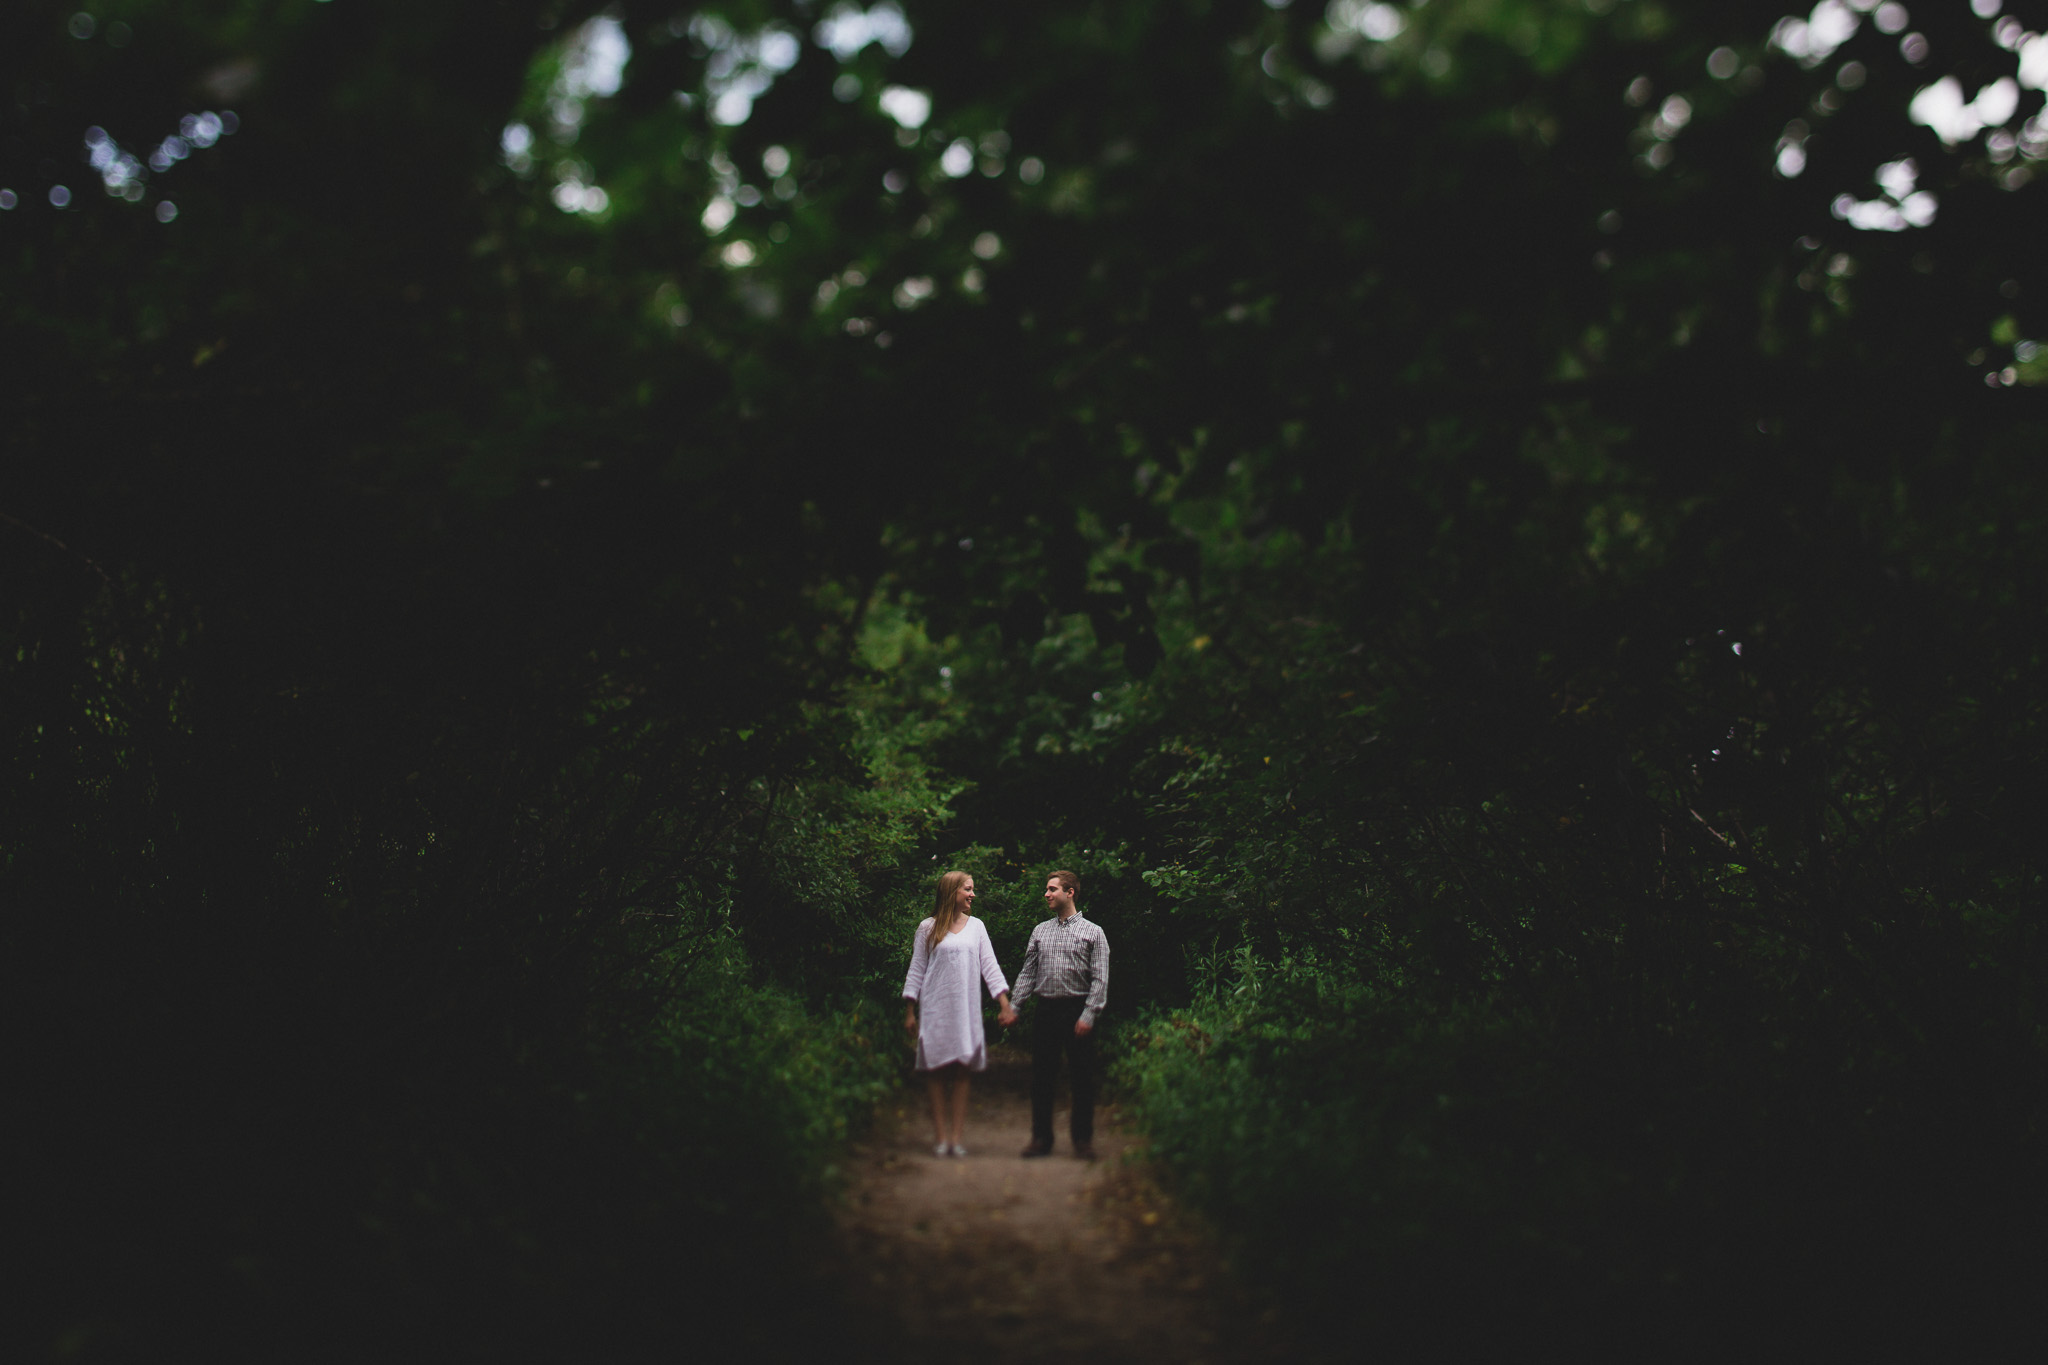 013-Jonathan-Kuhn-Photography-Marc-Kelsey-Engagement-WEB-7495.jpg